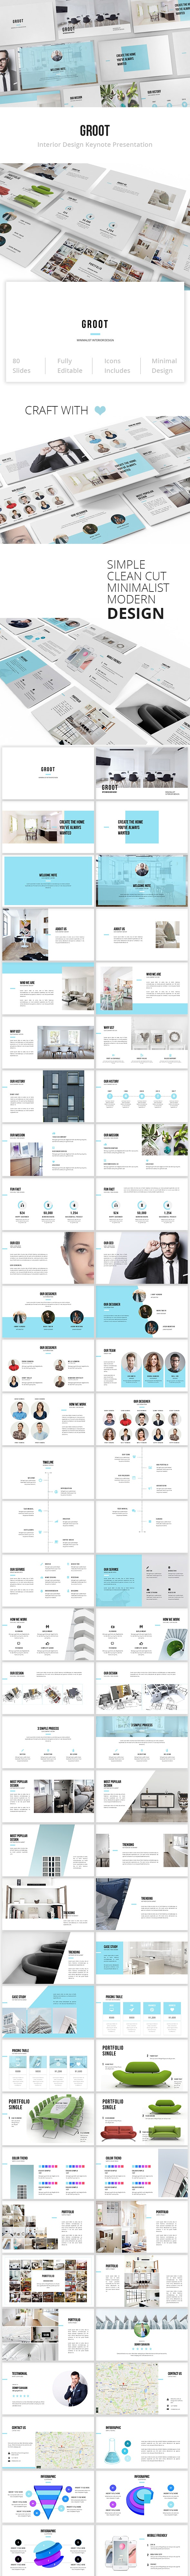 Groot - Interior Design Keynote Template - Creative Keynote Templates